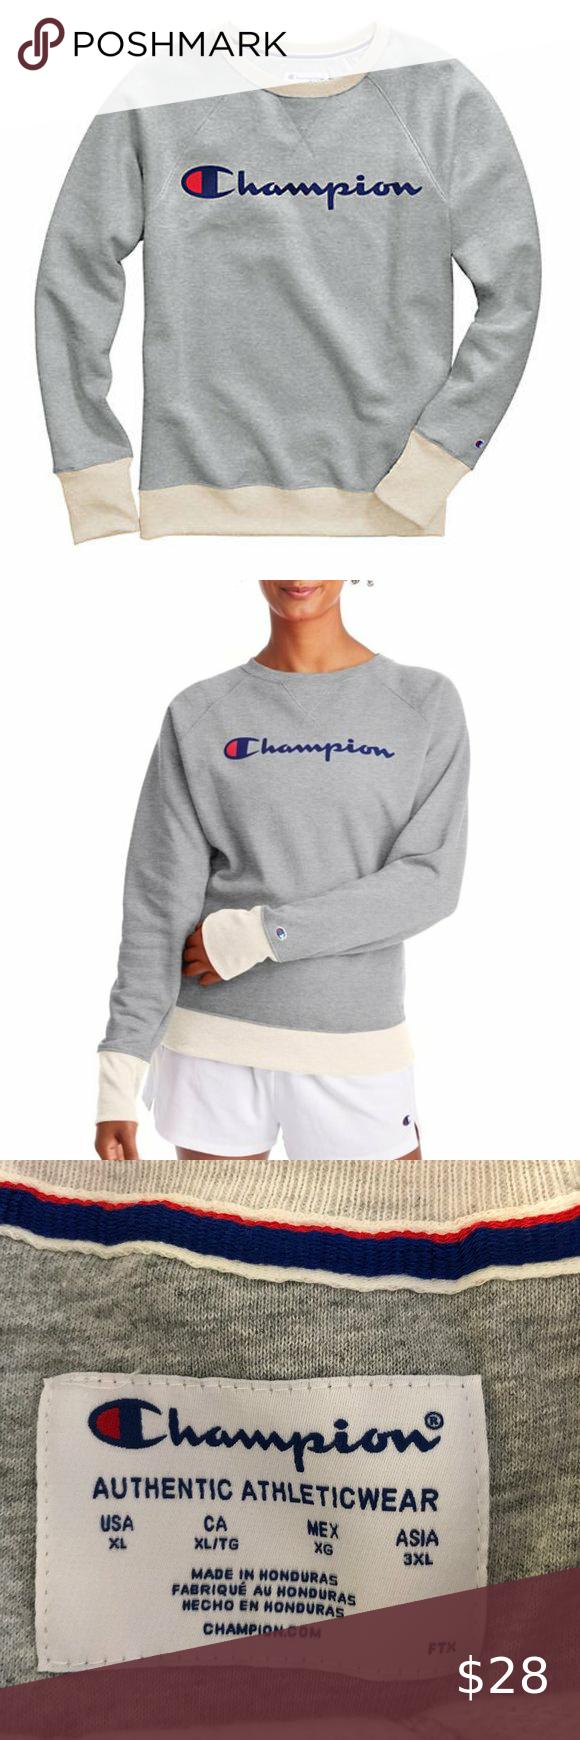 Champion Powerblend Graphic Crew Neck Sweatshirt In 2020 Branded Sweatshirts Graphic Crew Neck Sweatshirts Crew Neck Sweatshirt [ 1740 x 580 Pixel ]